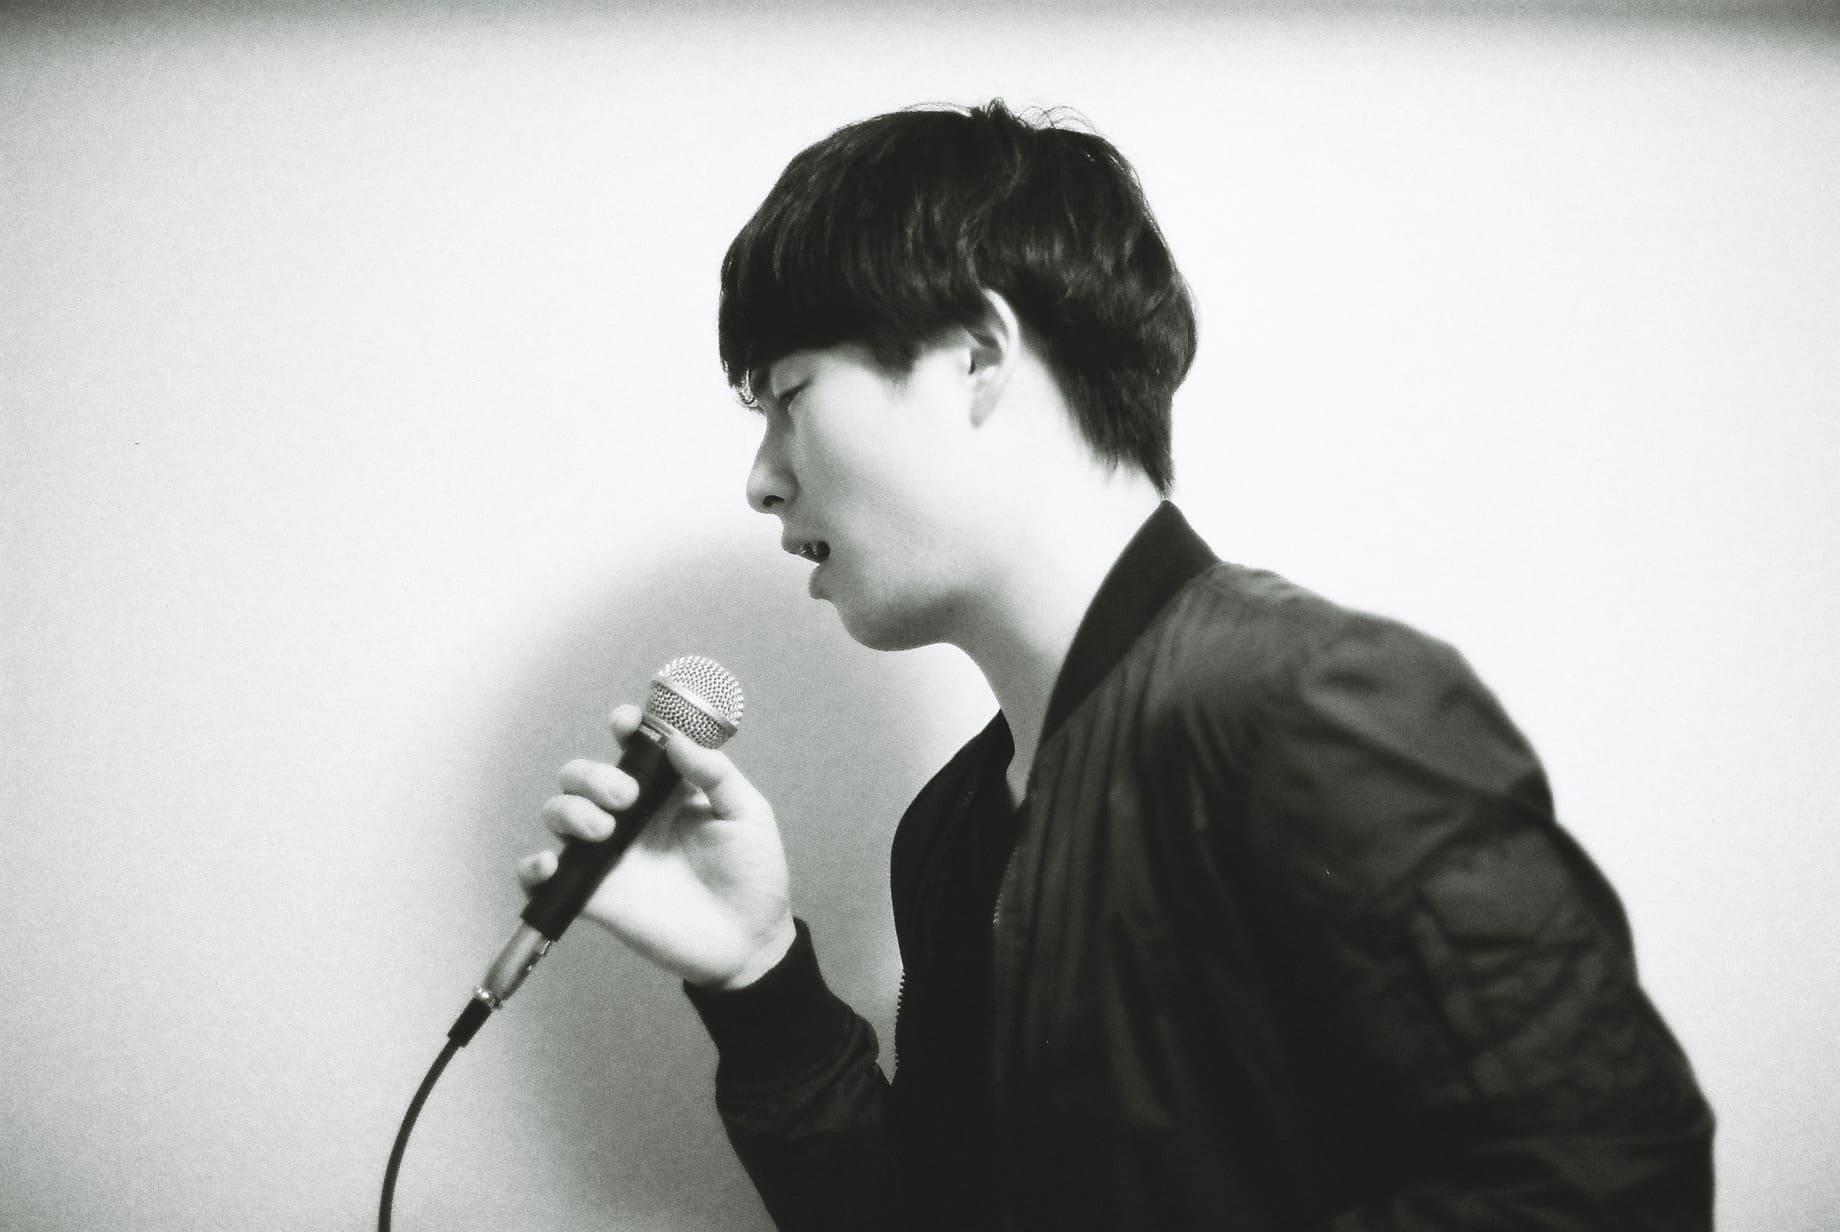 YONG(ヨン)